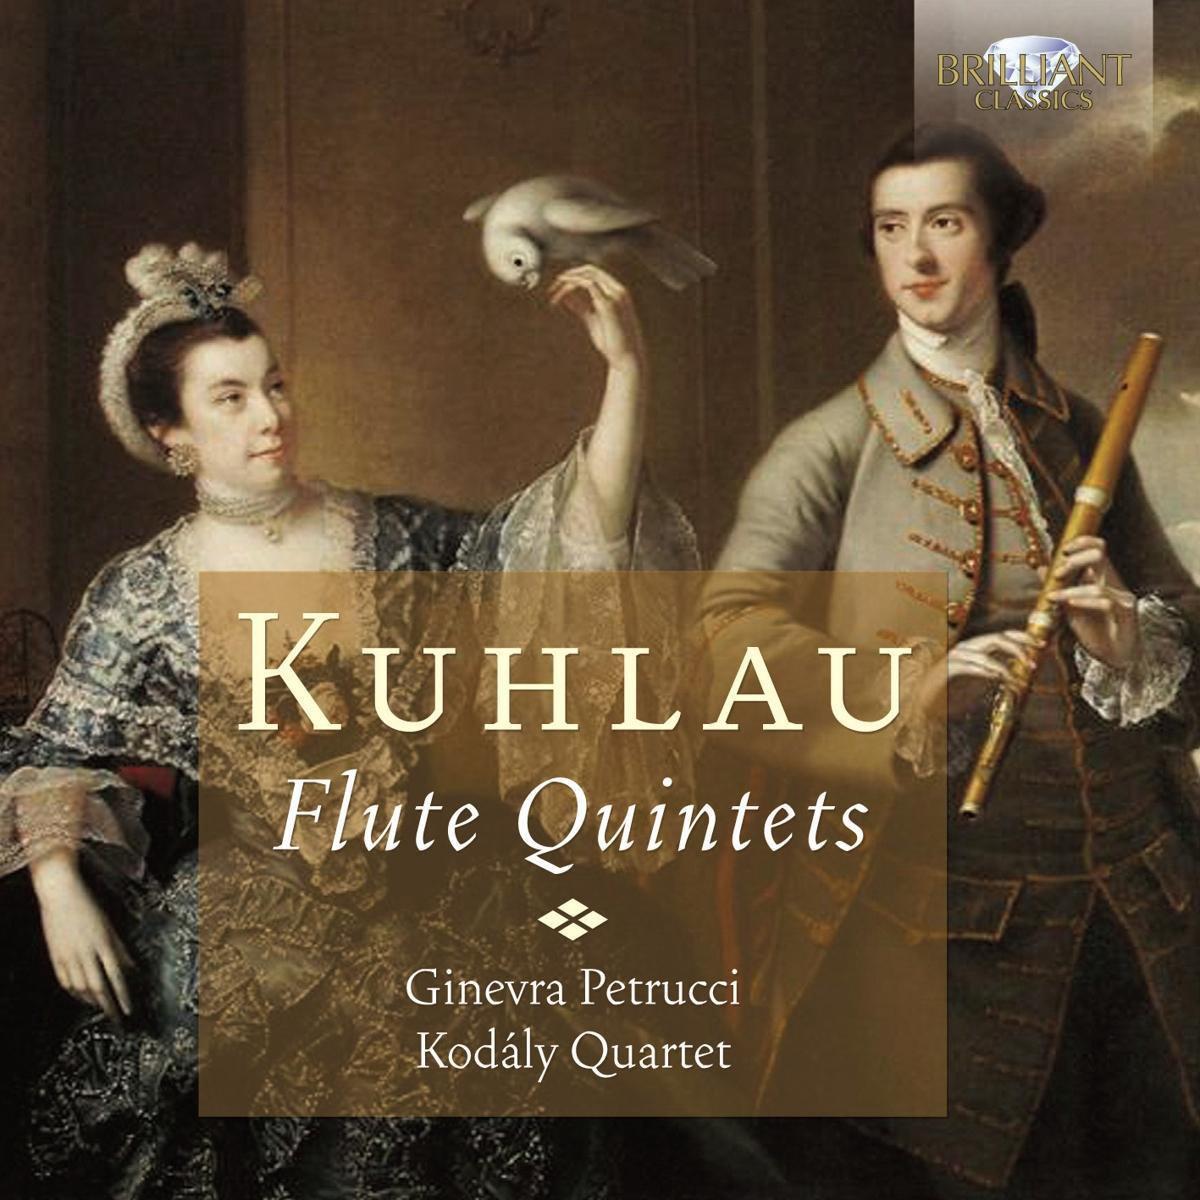 Kuhlau: Flute Quintets - Ginevra Petrucci